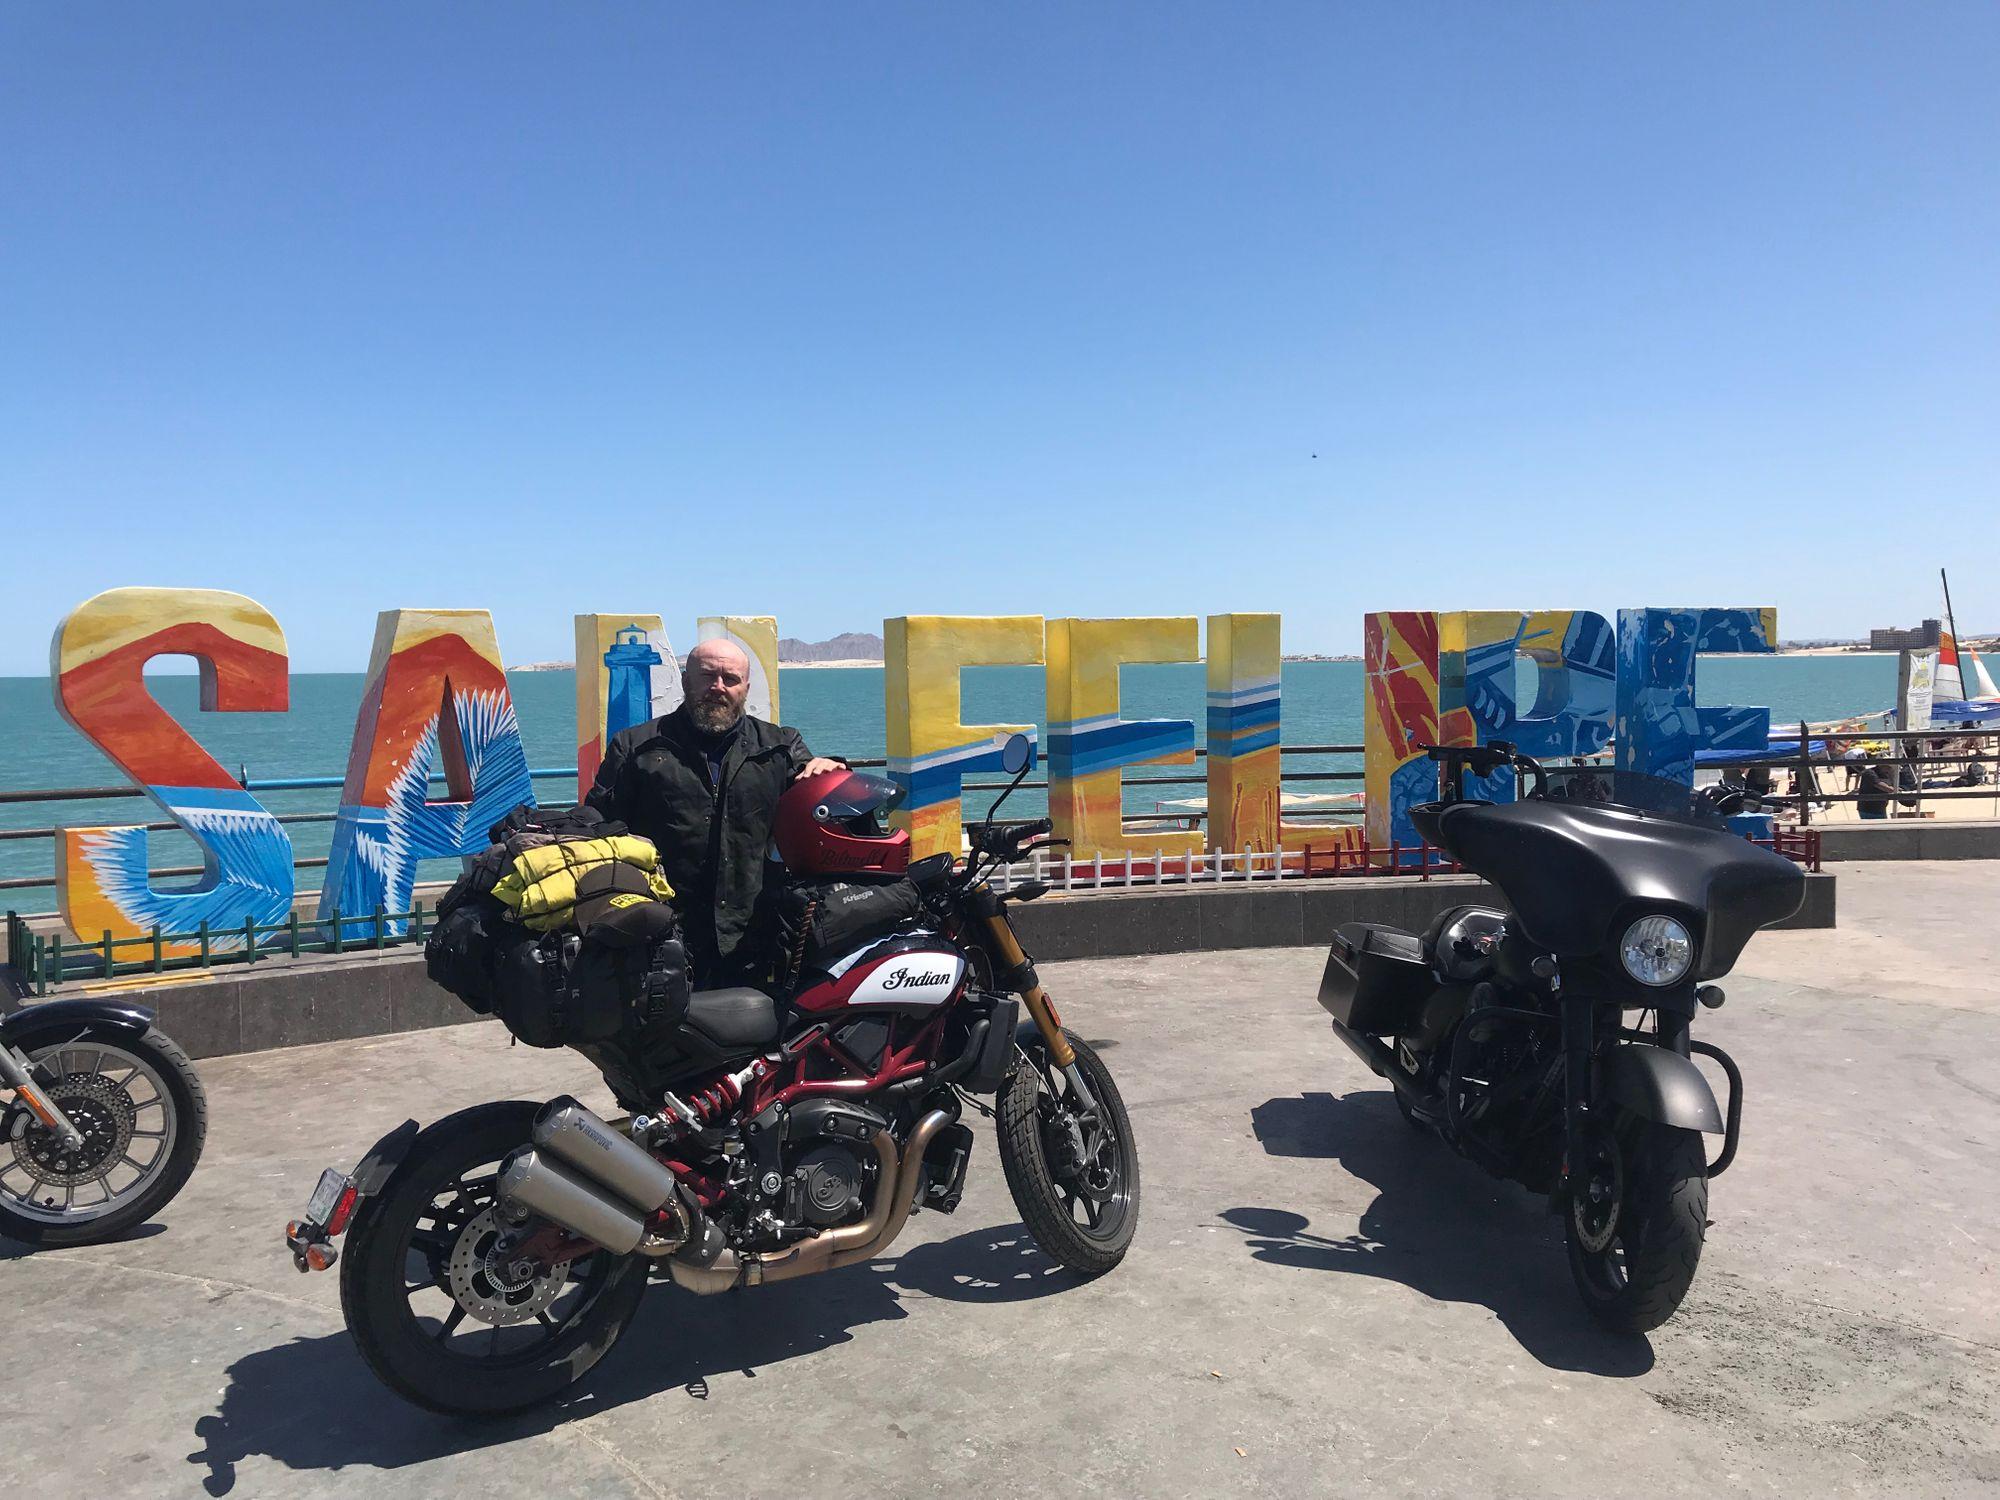 Touring on the Indian FTR 1200 - 3,000 Miles to El Diablo